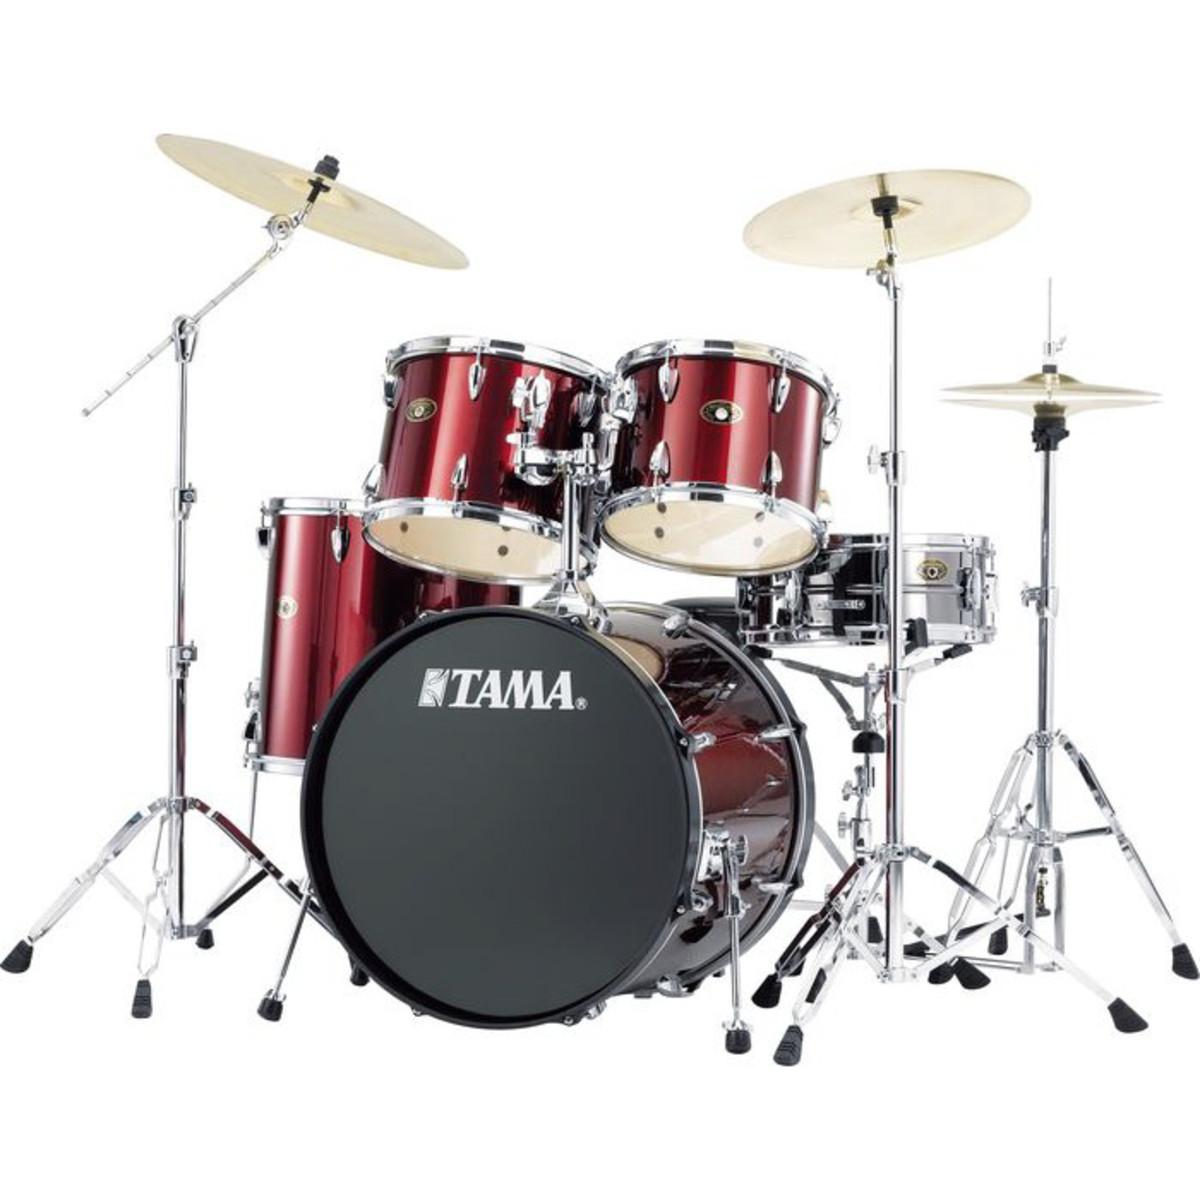 tama imperialstar rock drum kit red ex demo at gear4music. Black Bedroom Furniture Sets. Home Design Ideas